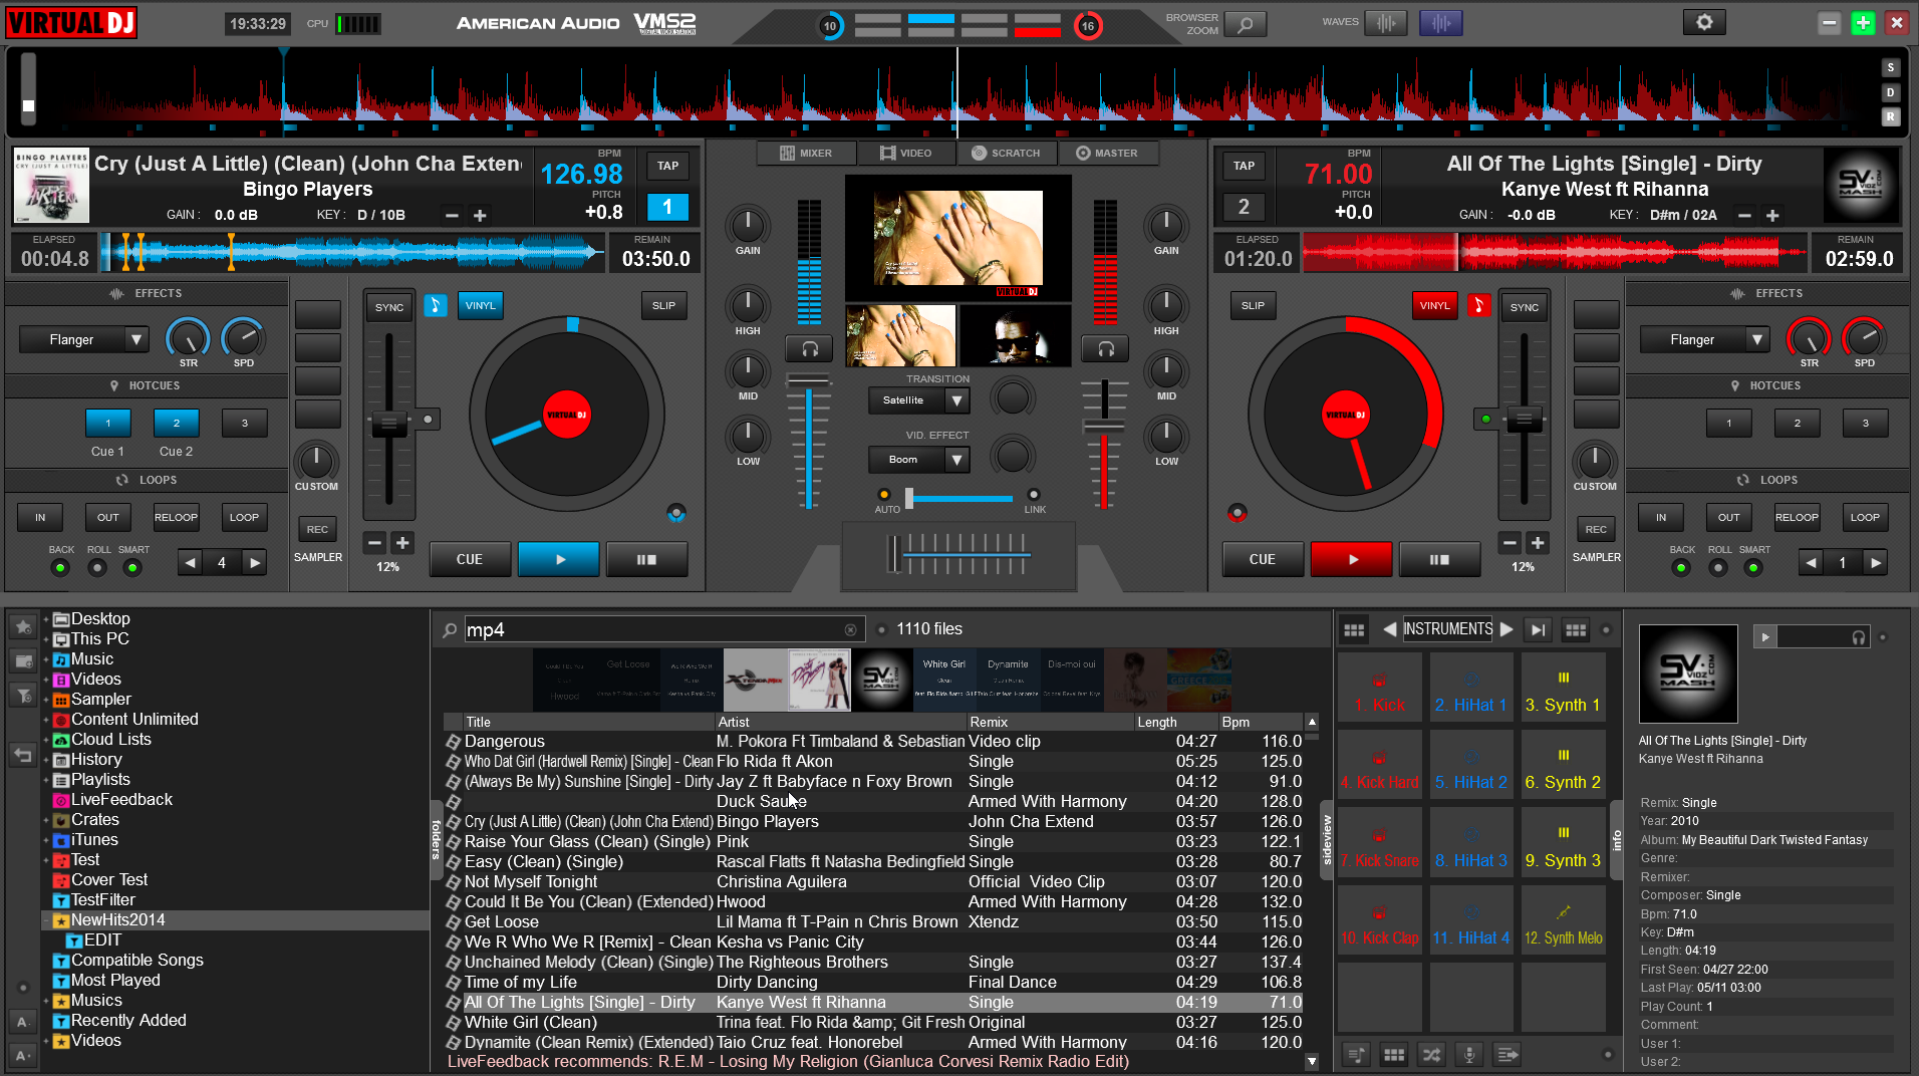 Virtual DJ 7.4 Skins Plugins Effects & Samples